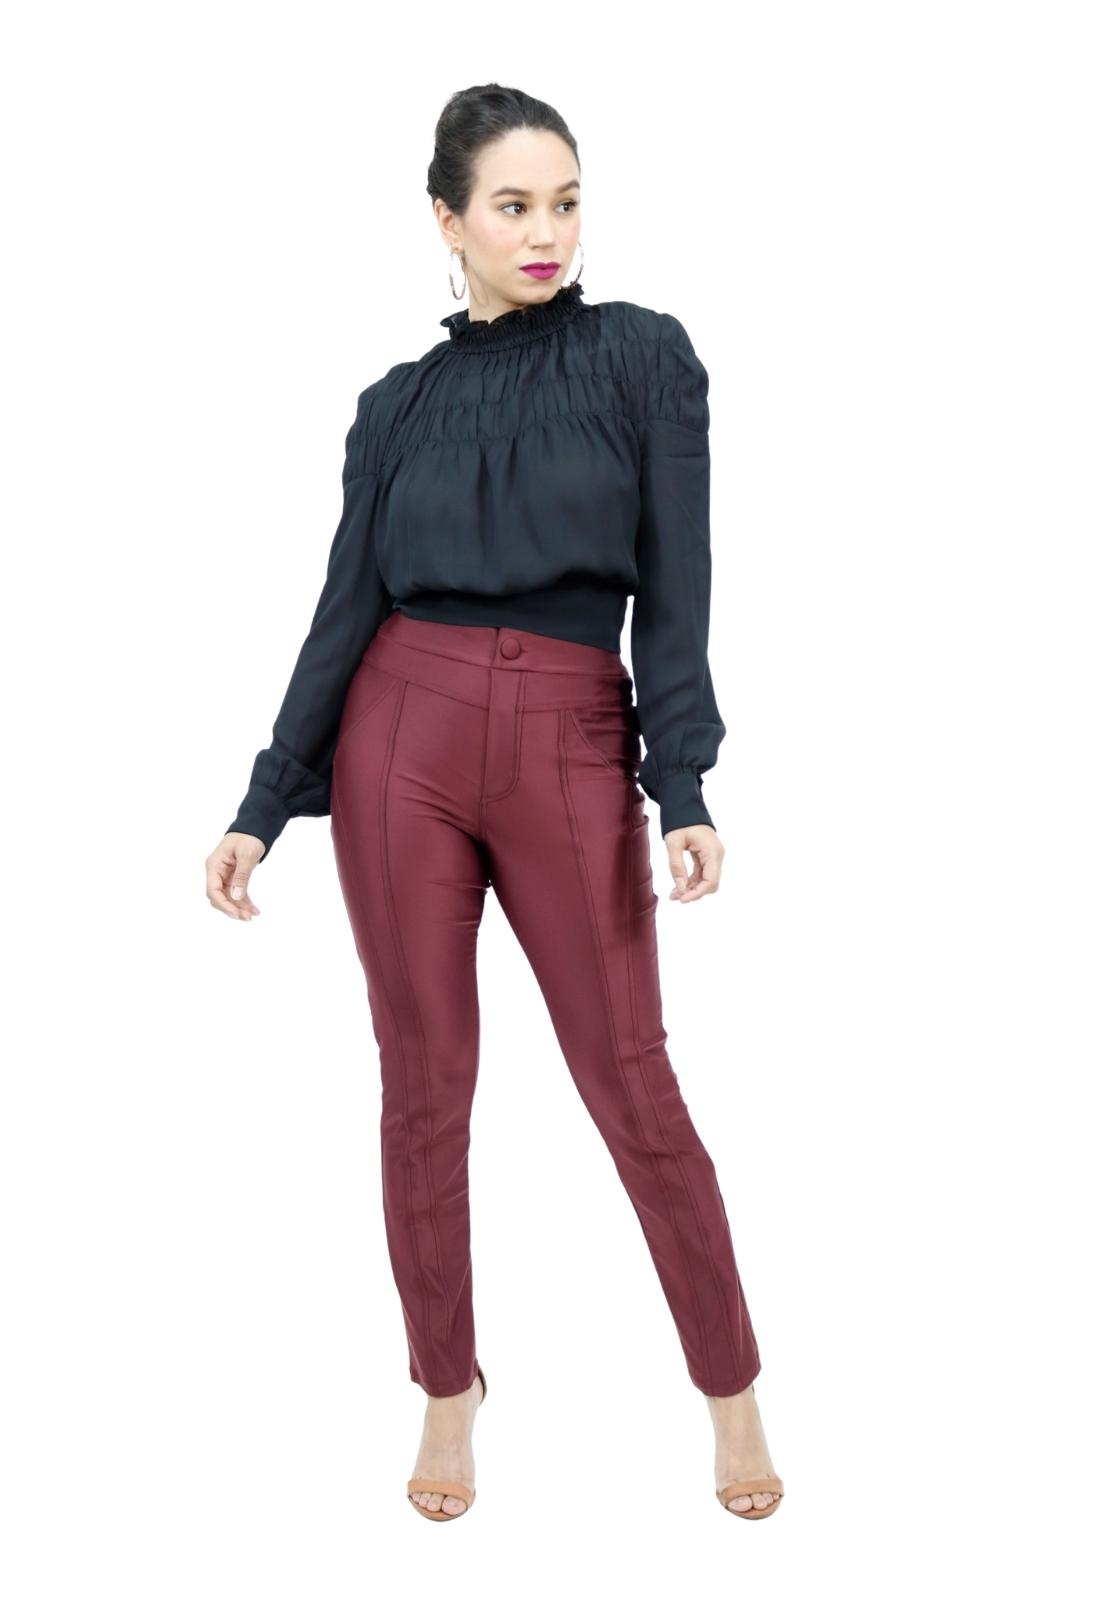 Calça Feminina Skinny Prada Costura Dupla